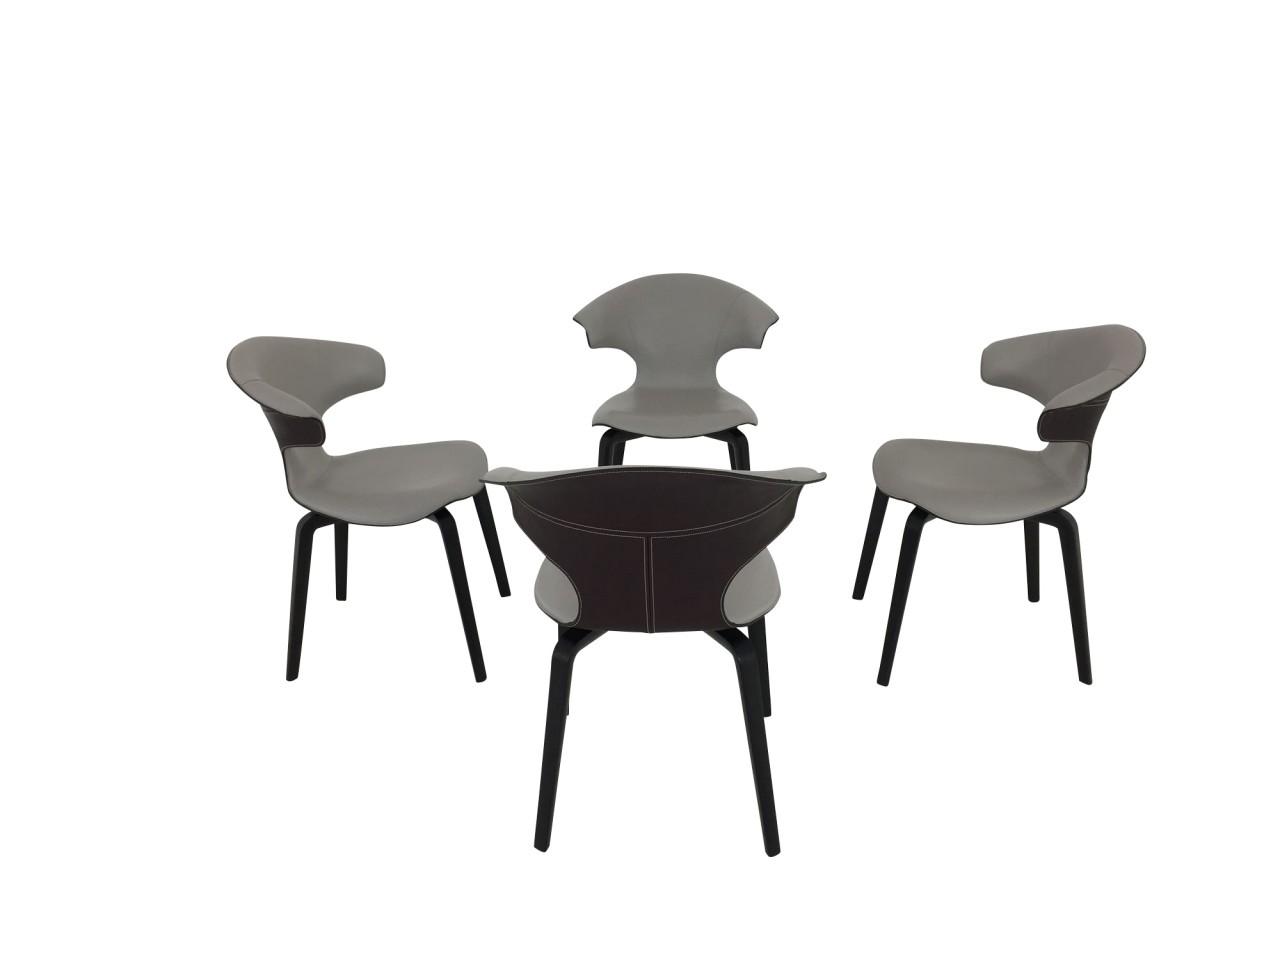 Poltrona Frau 4 Stück MONTERA Stühle mit Armteil im saddle extra Leder Moro und Leder SC Tortora